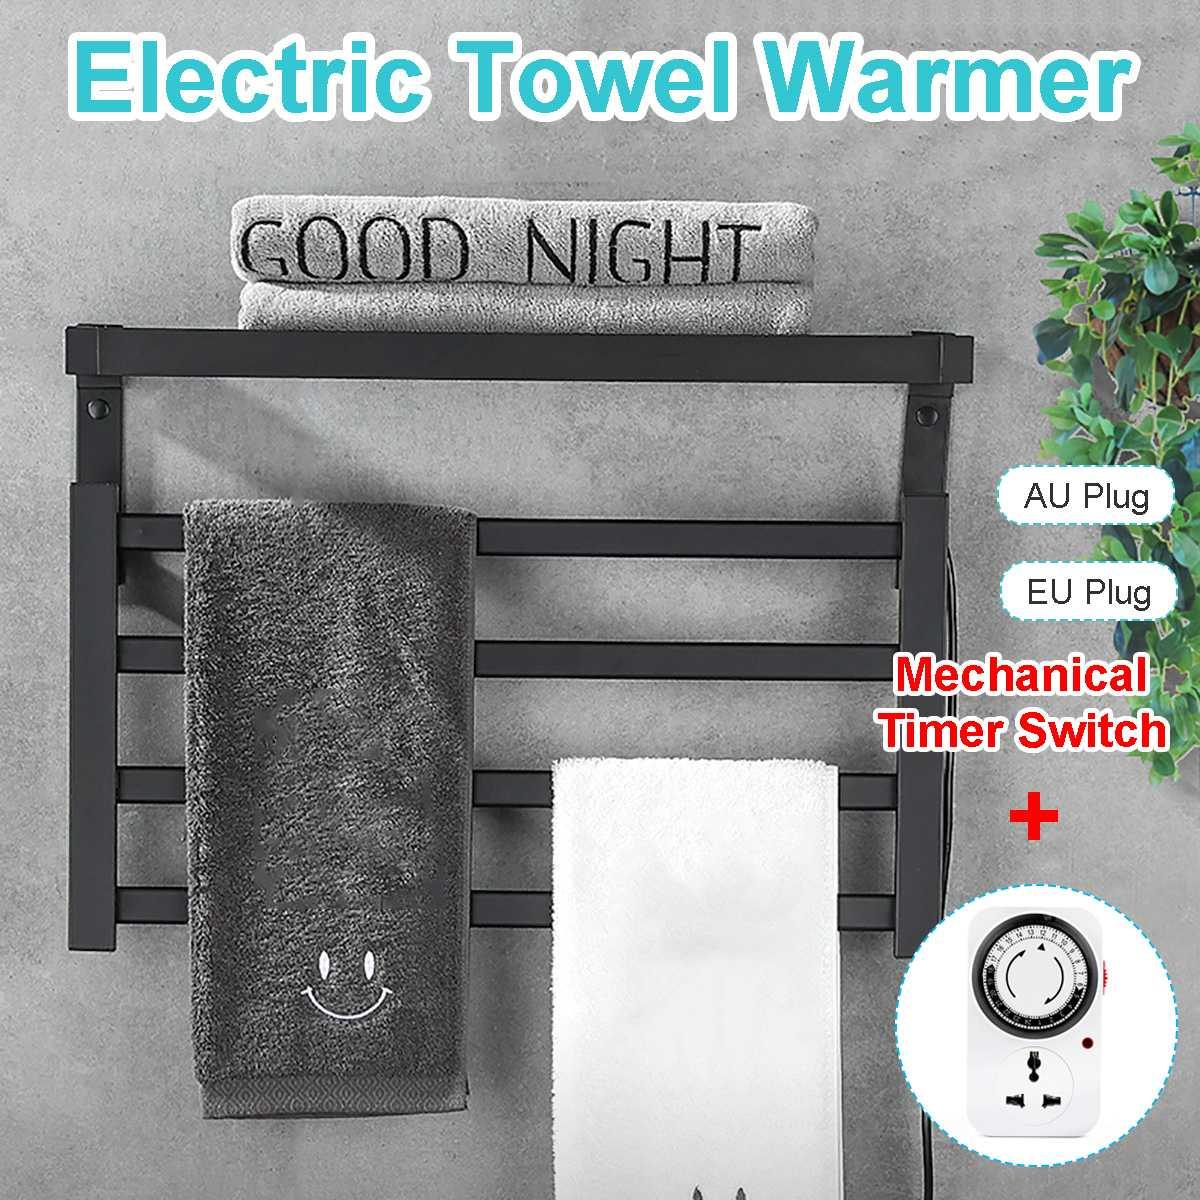 Stainless Steel Sterilizing Smart Towel Dryer With Au/eu Plug Loop Universal Timing Socket Mechanical Timer